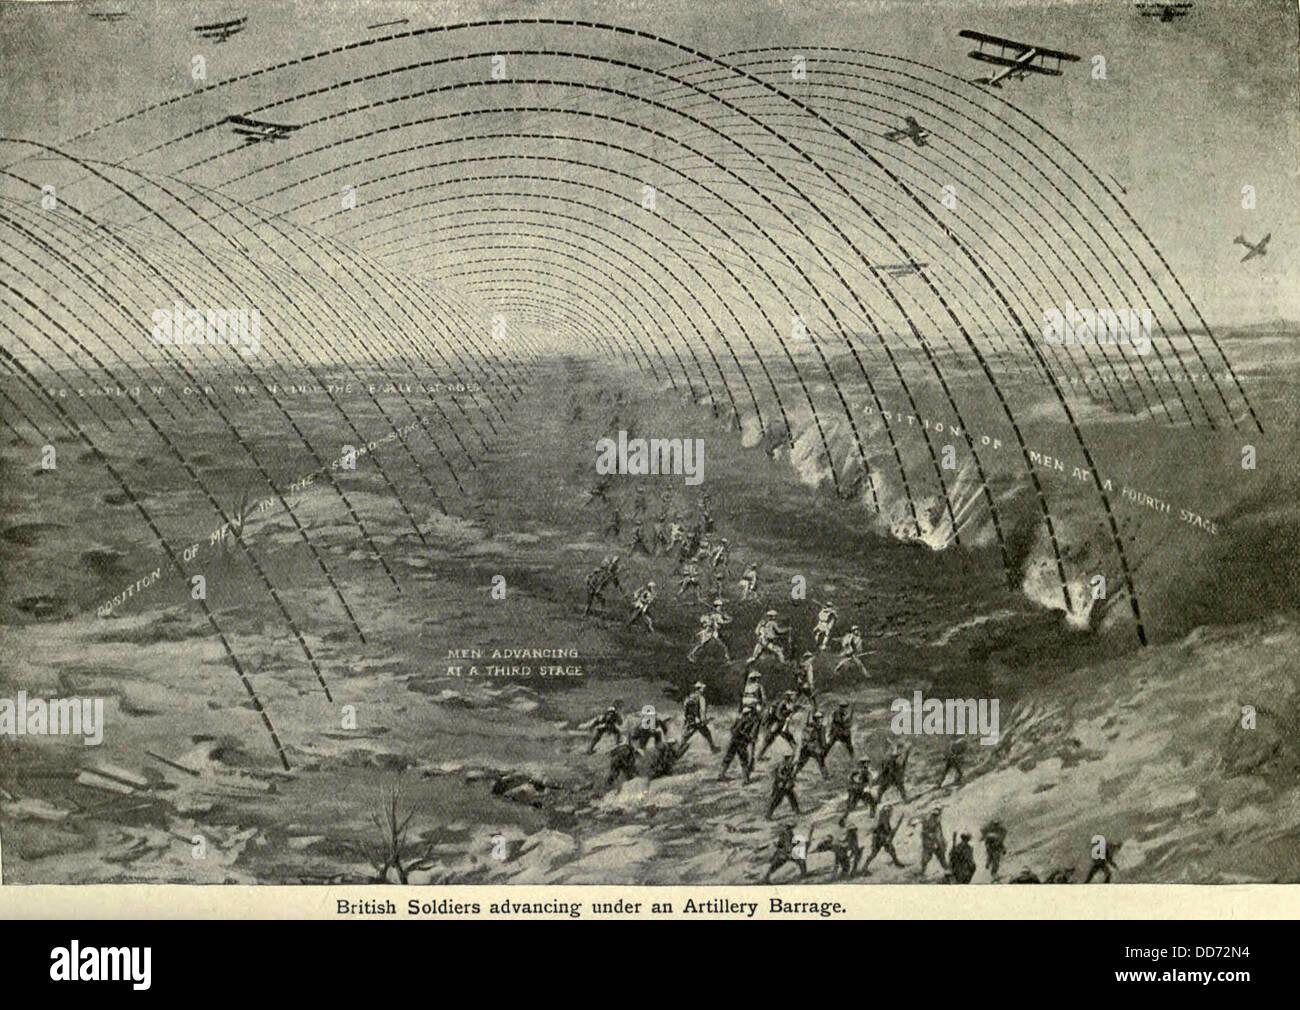 World War 1 Diagram Of British Sol Rs Advancing Under A